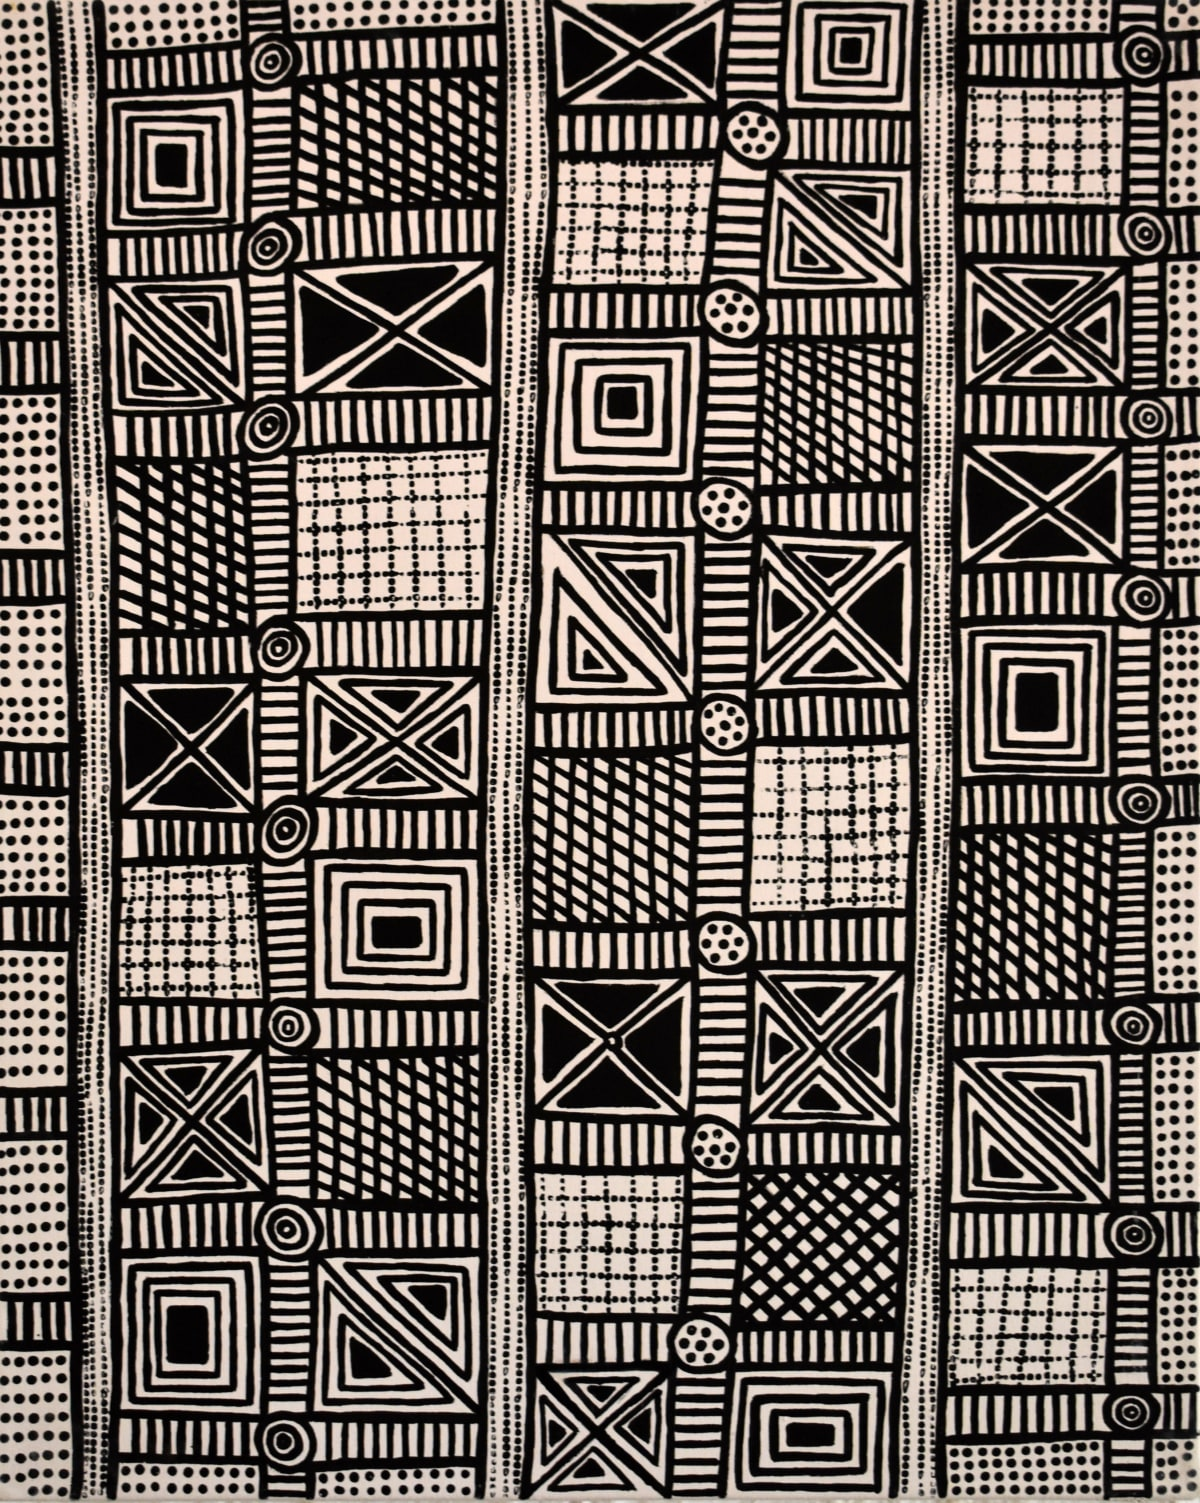 Tina Patlas Jilamara natural ochres on canvas 70 x 90 cm